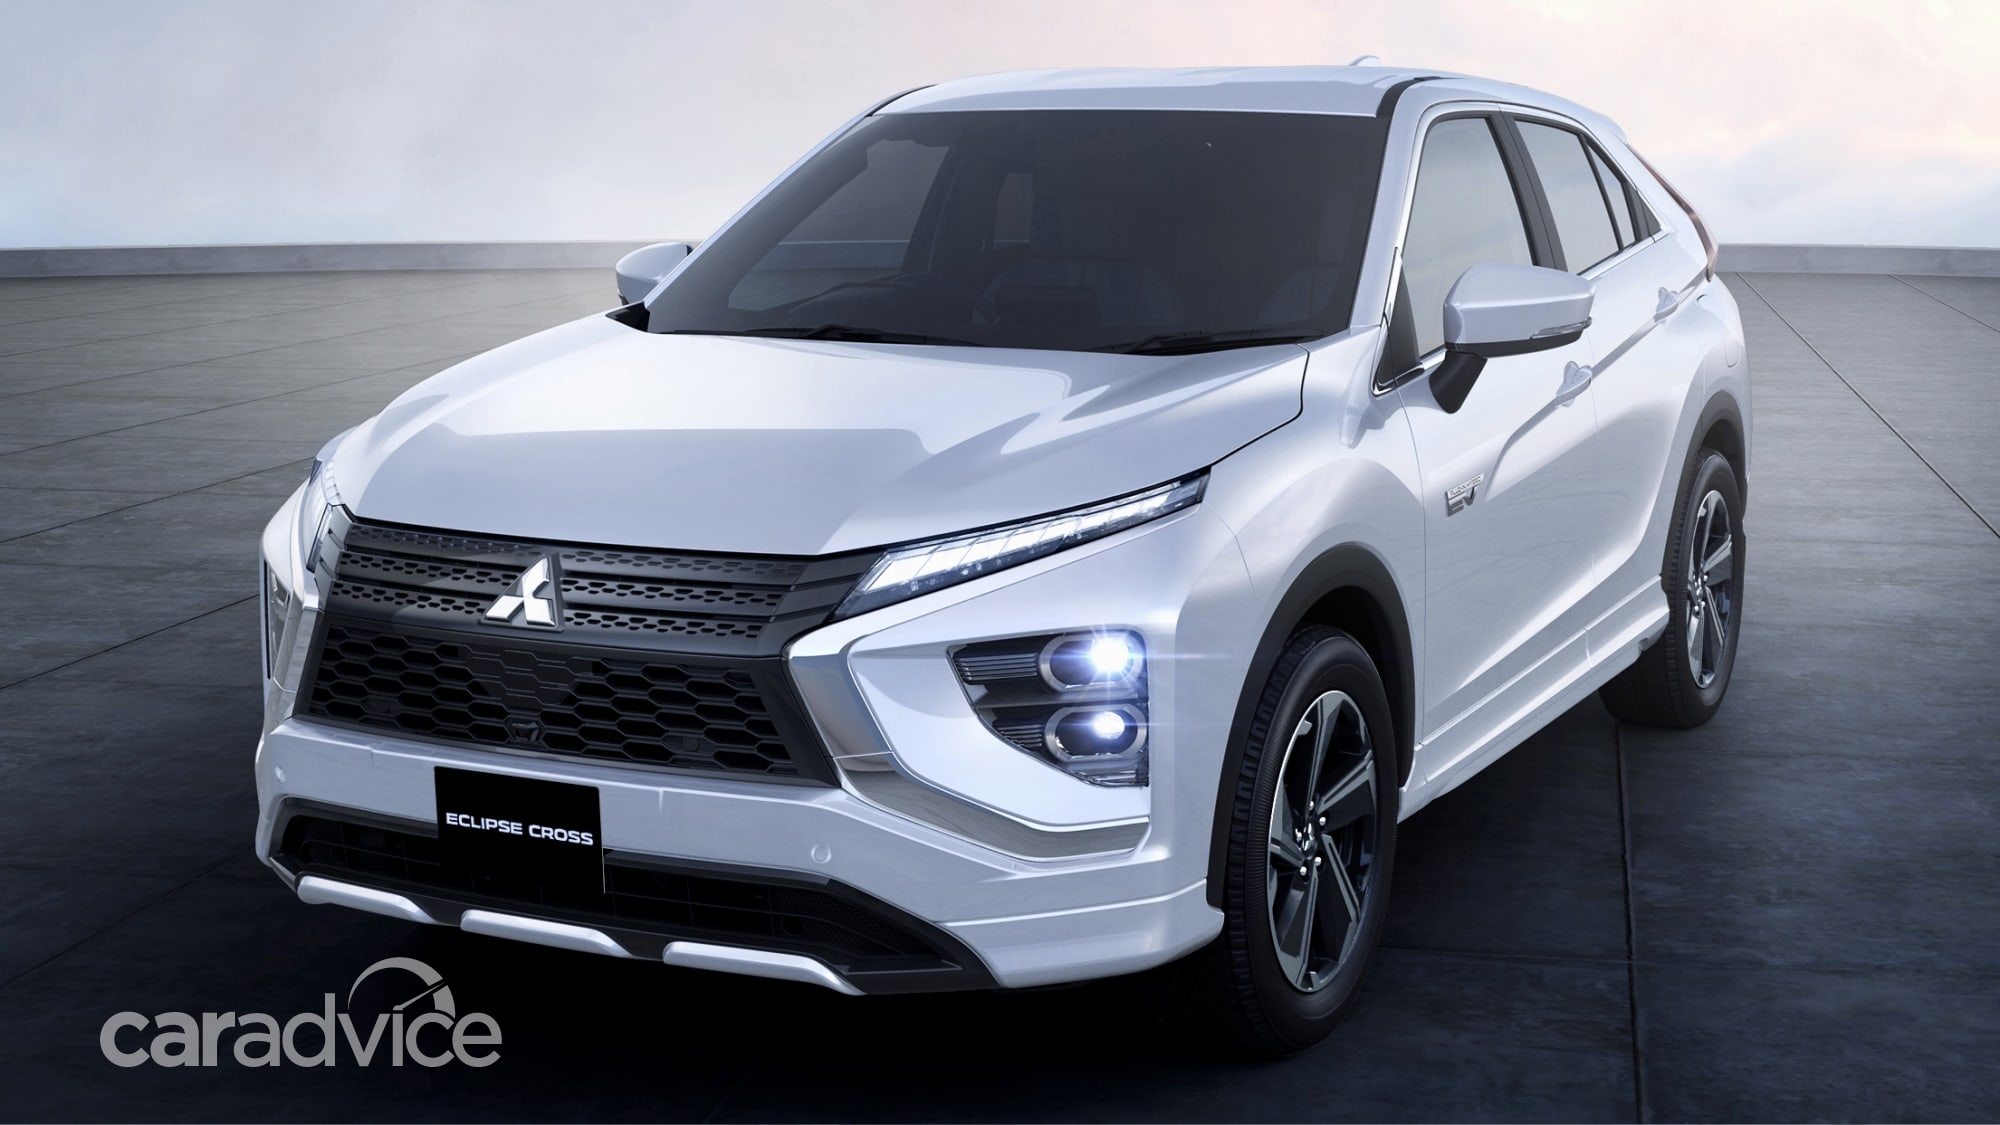 2021 Mitsubishi Eclipse Cross revealed | CarAdvice